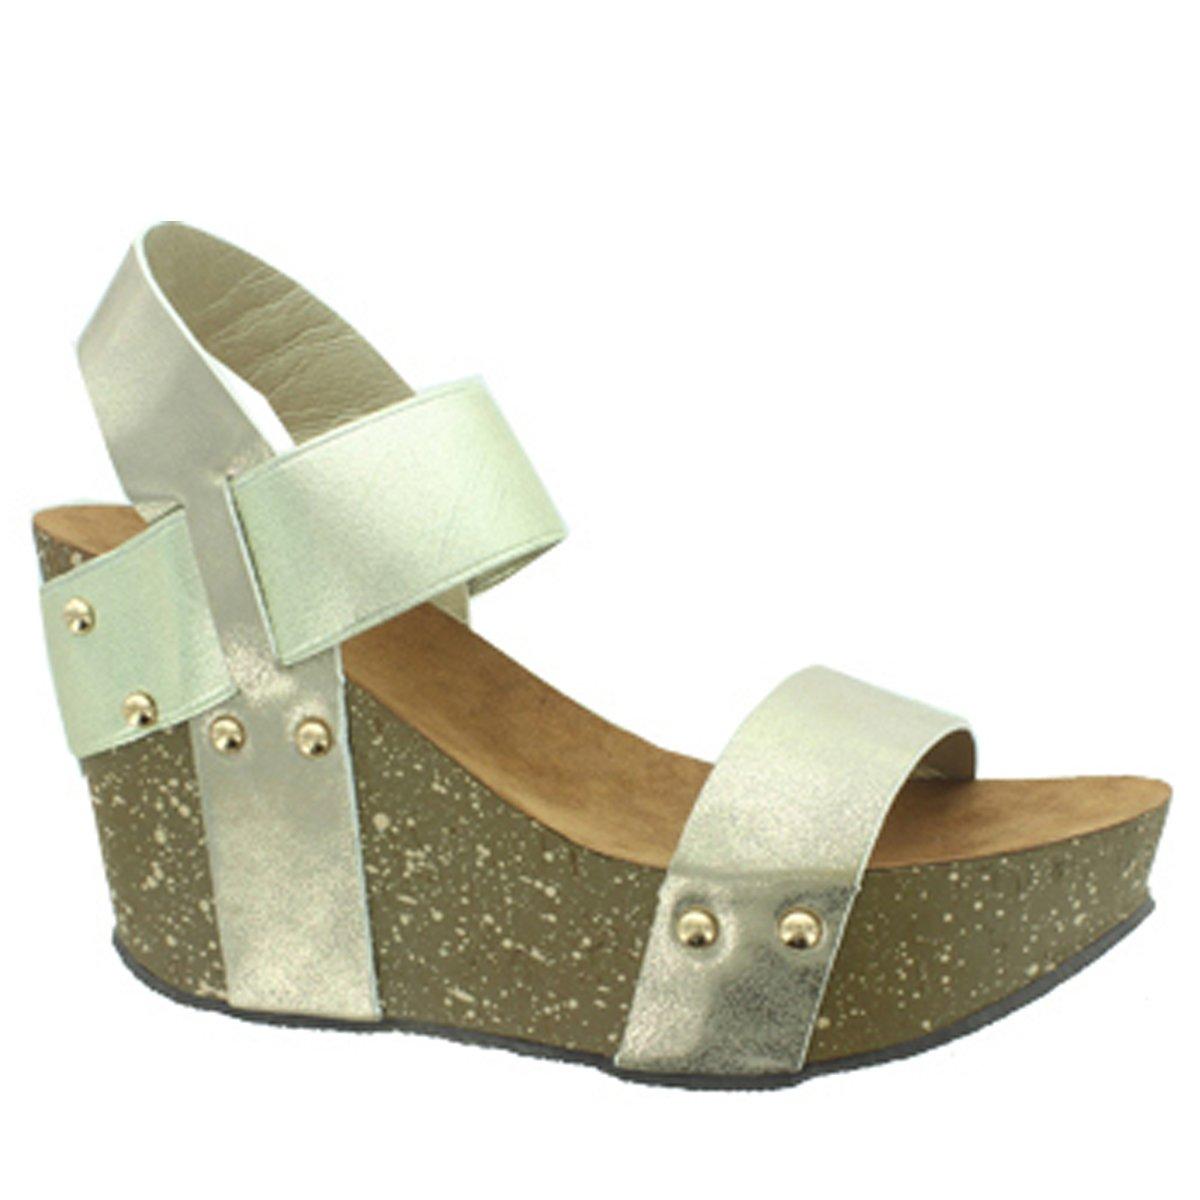 ce6fcd0ddb Amazon.com | Pierre Dumas Ellie-1 Women's Studded Platform Wedge Sandals,  Pewter, 10M | Platforms & Wedges